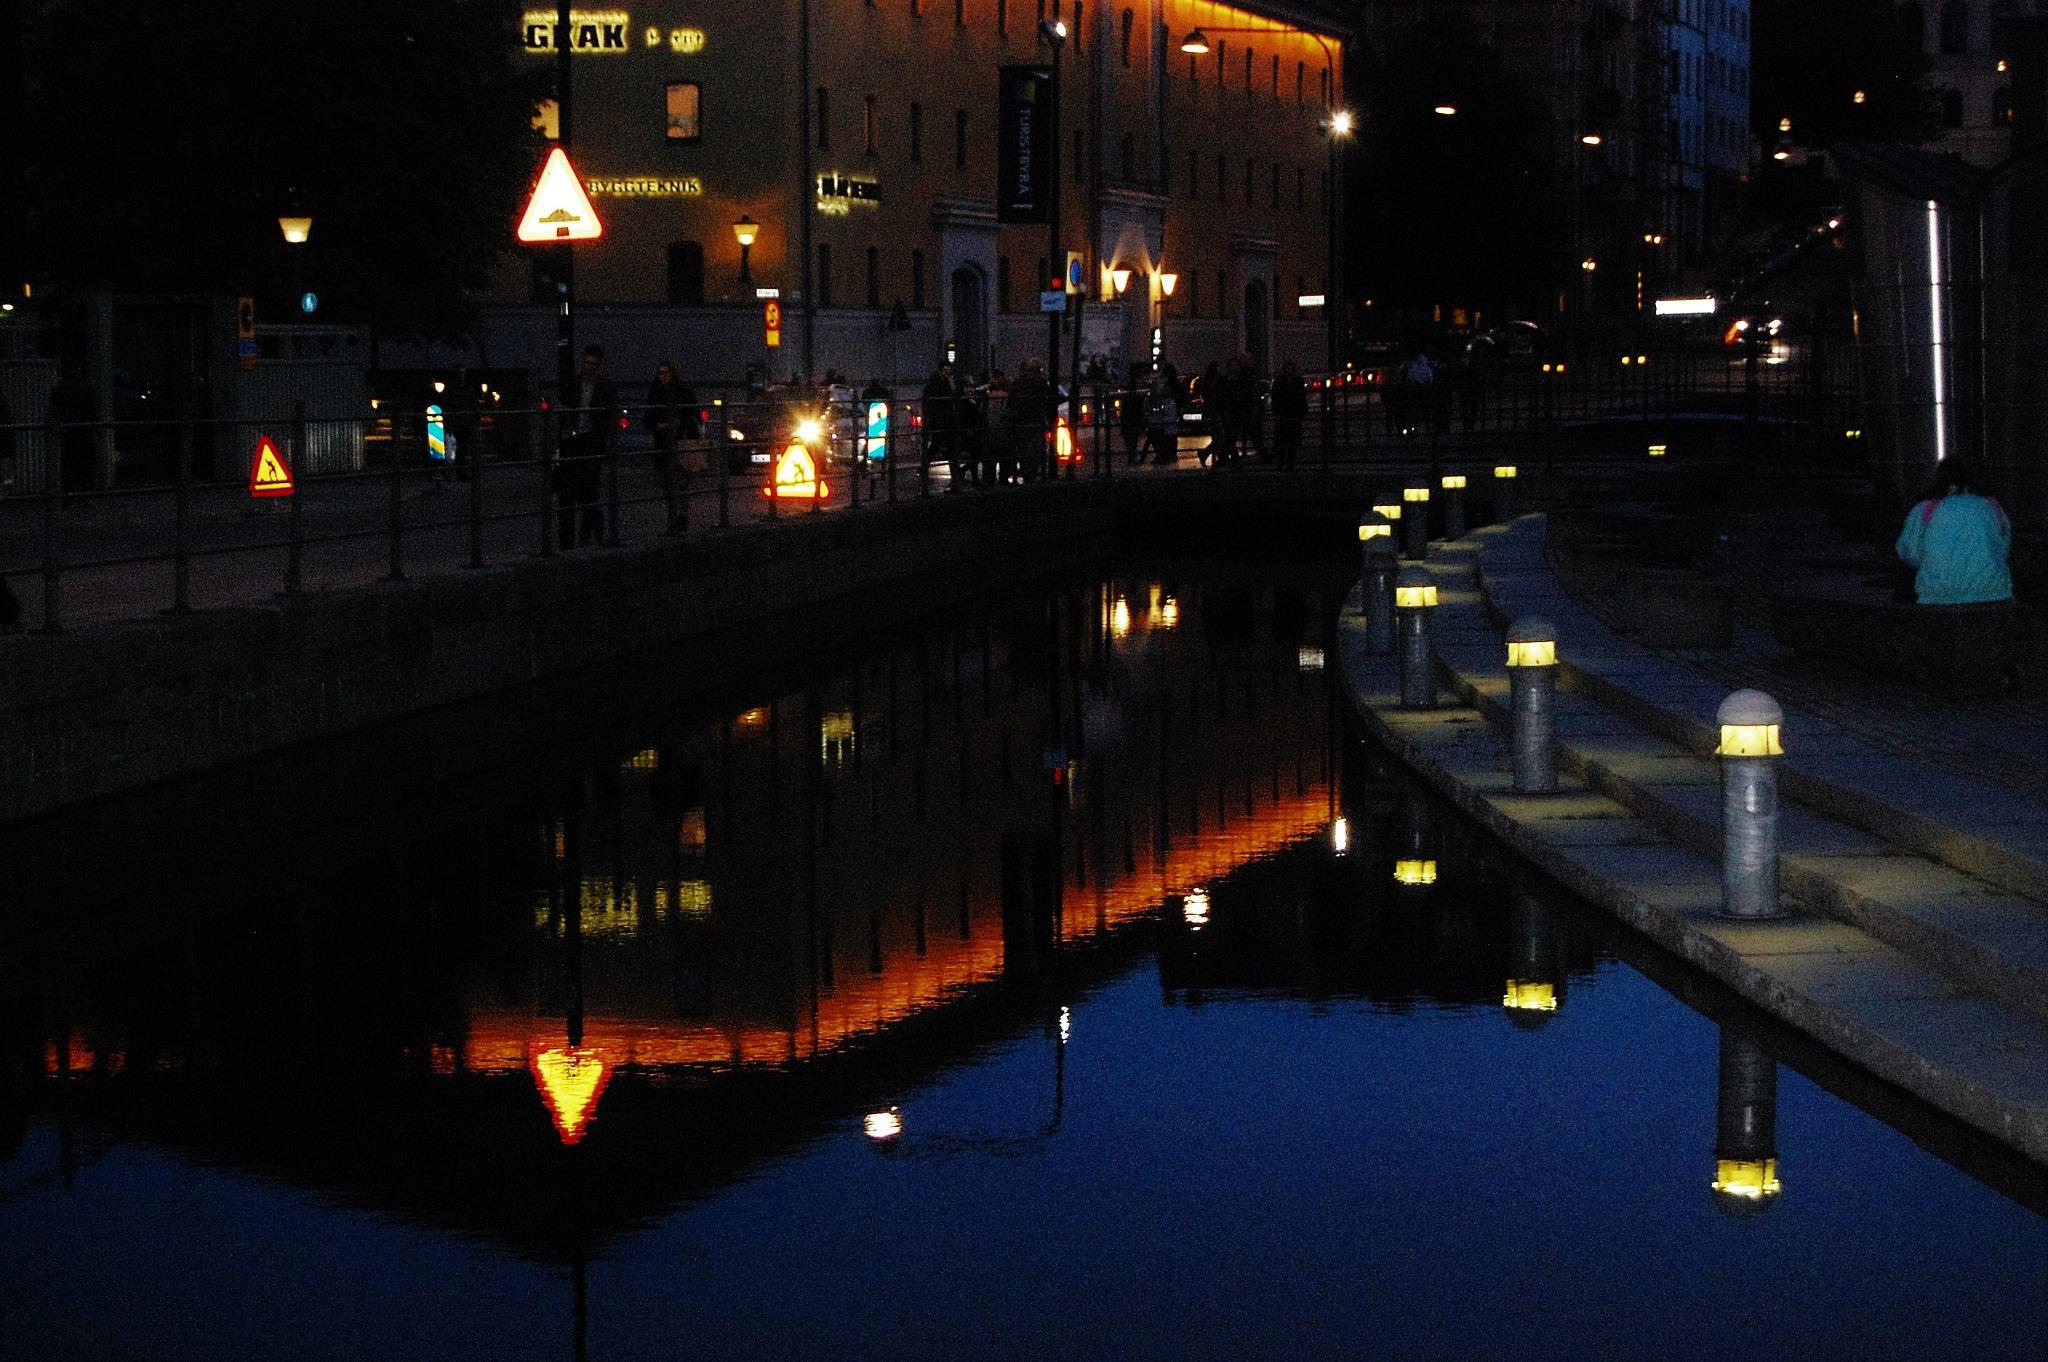 Reflections in the night by lillemor.ekstrom ek